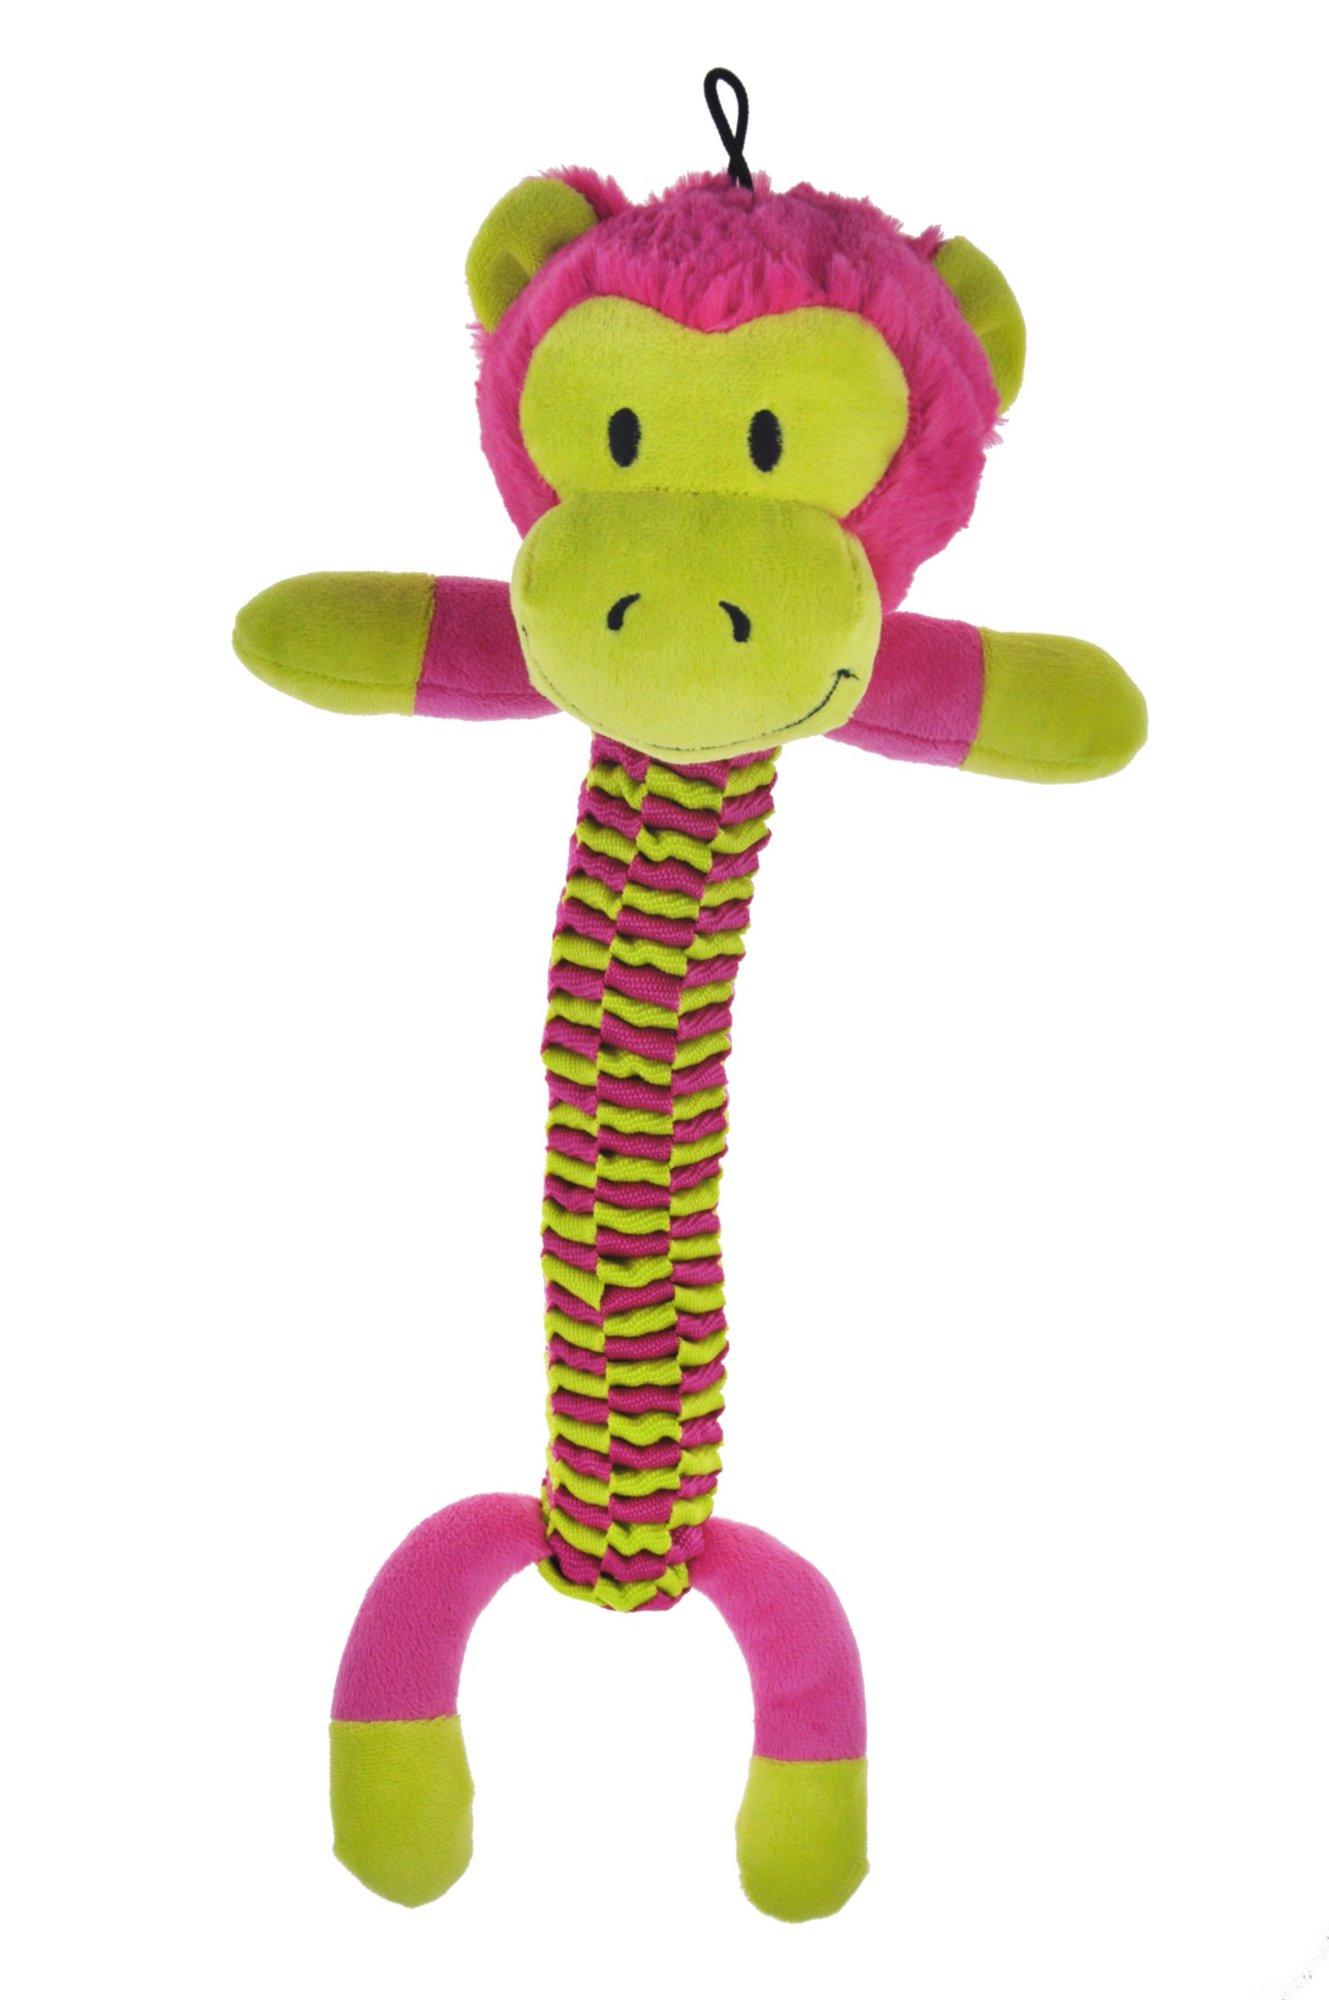 Bark A Boo Woven Body Twister Monkey